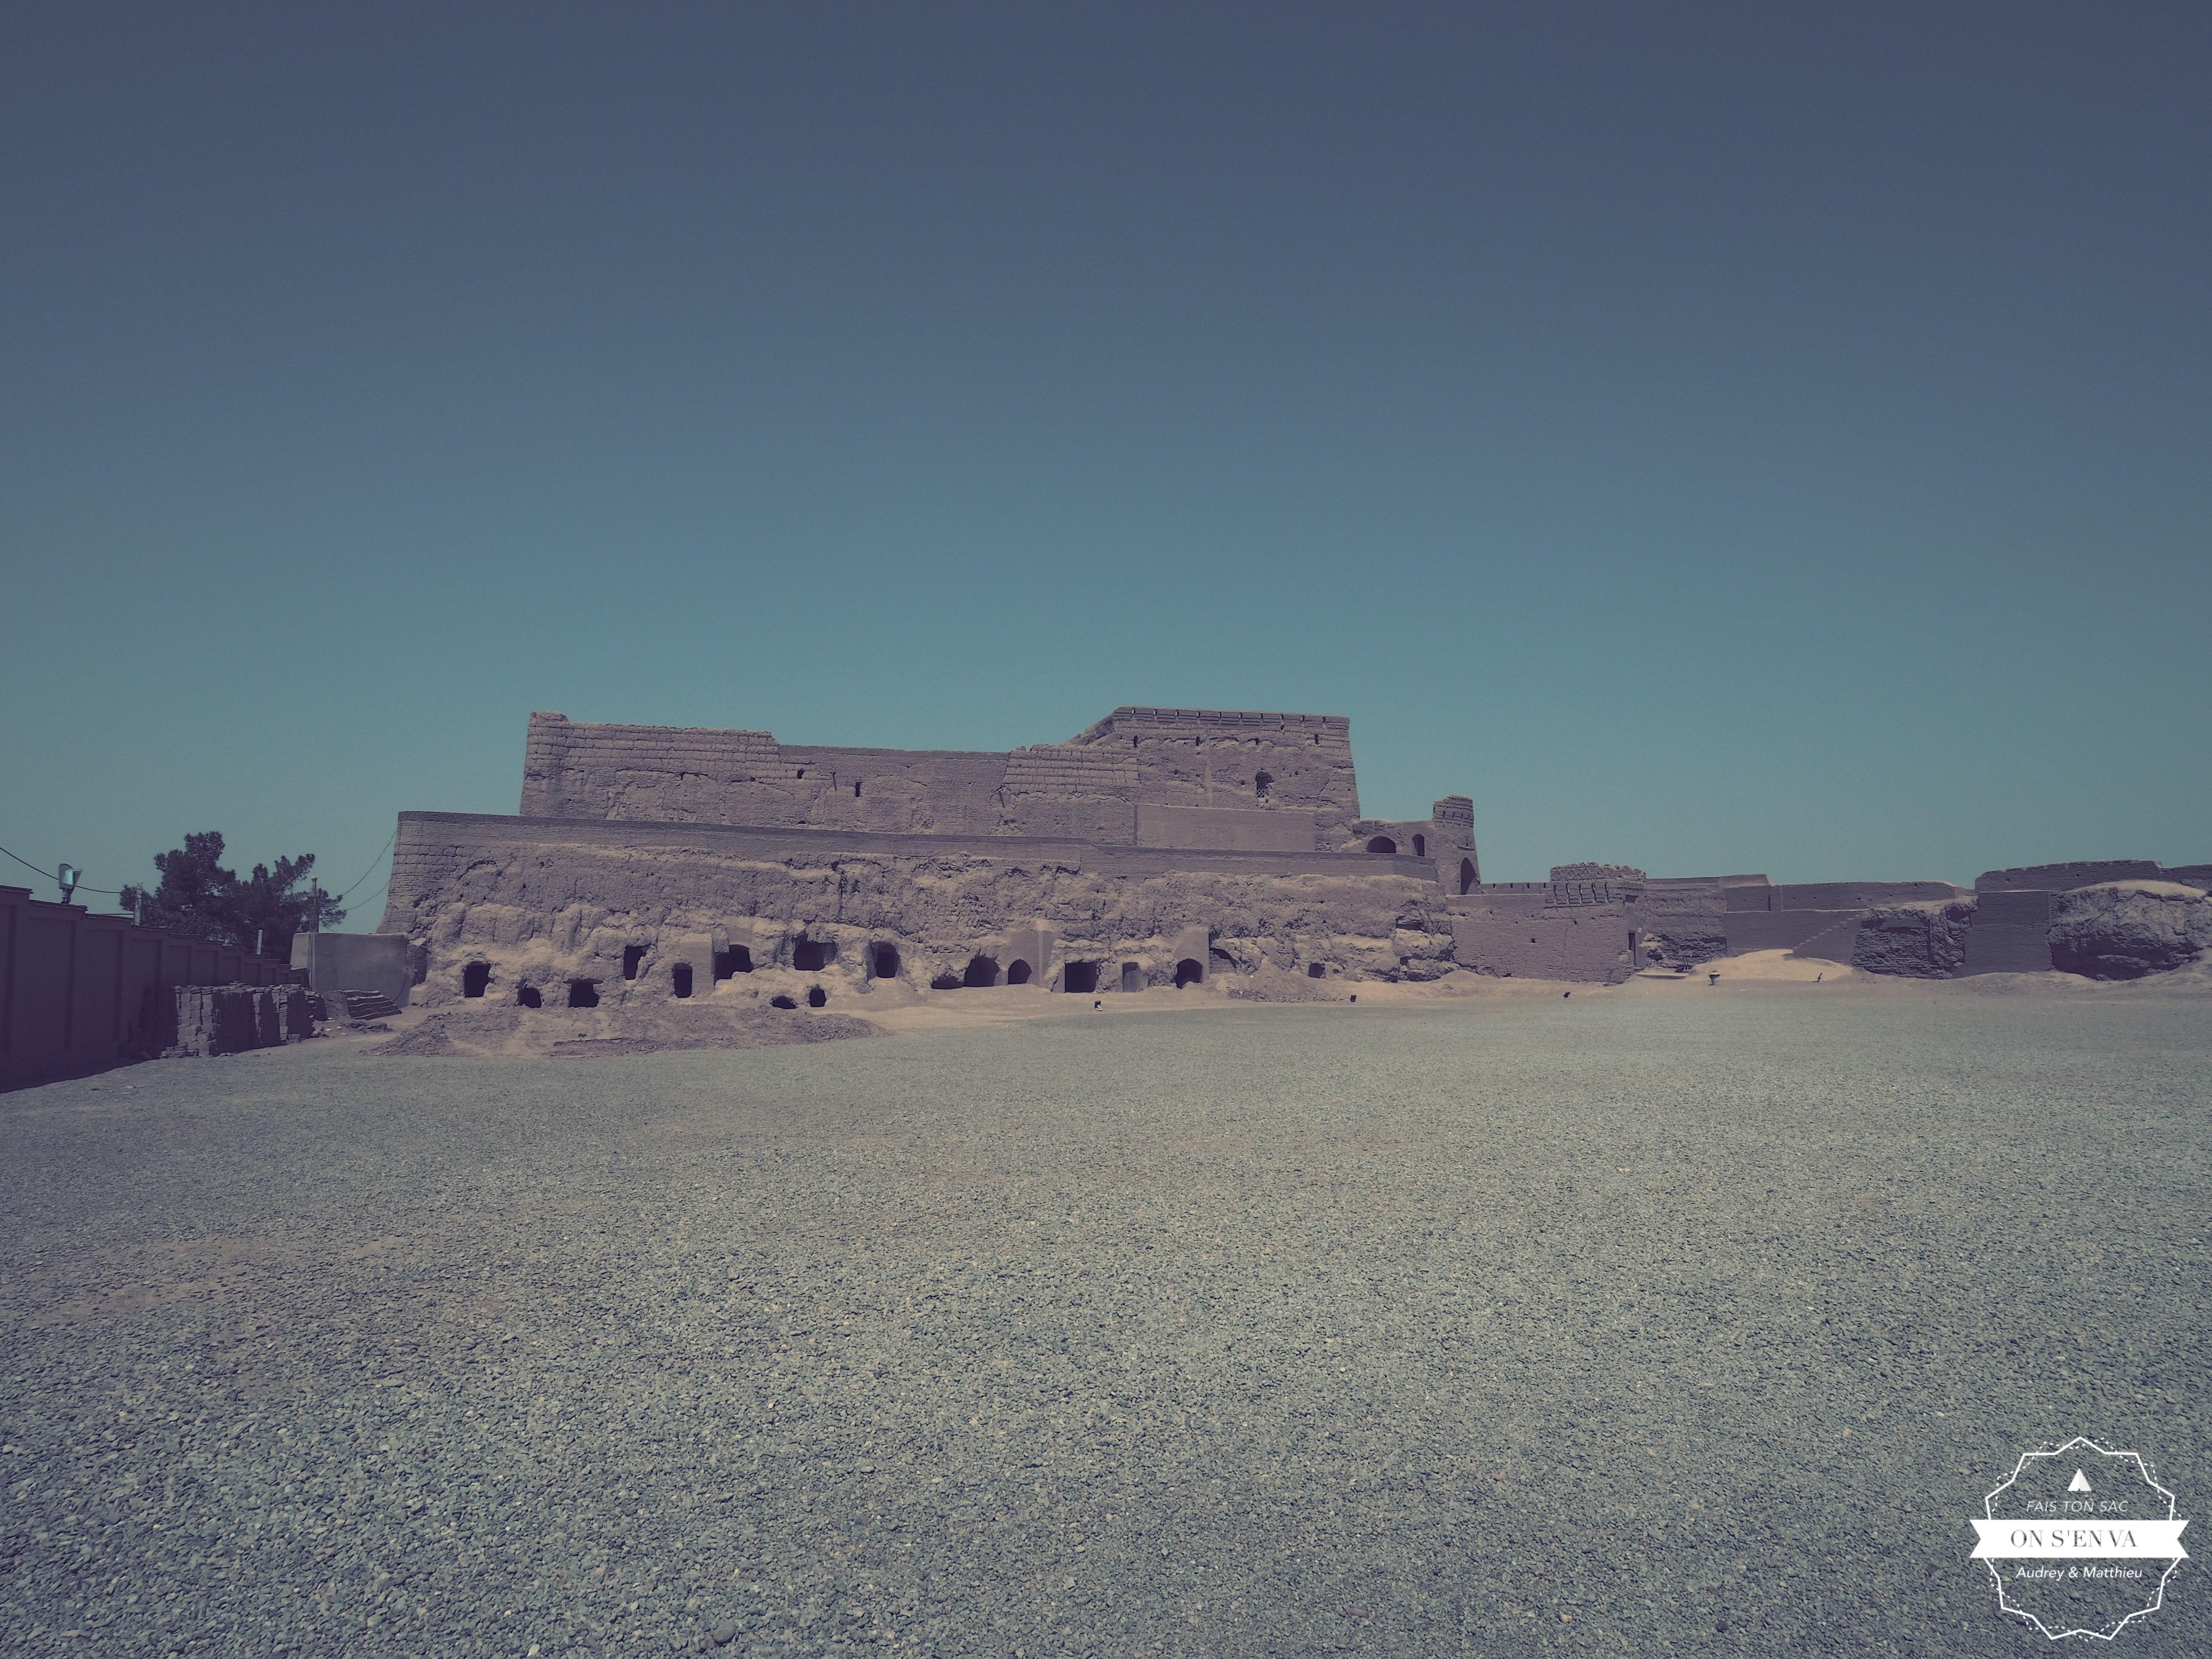 Le chateau de Meybod